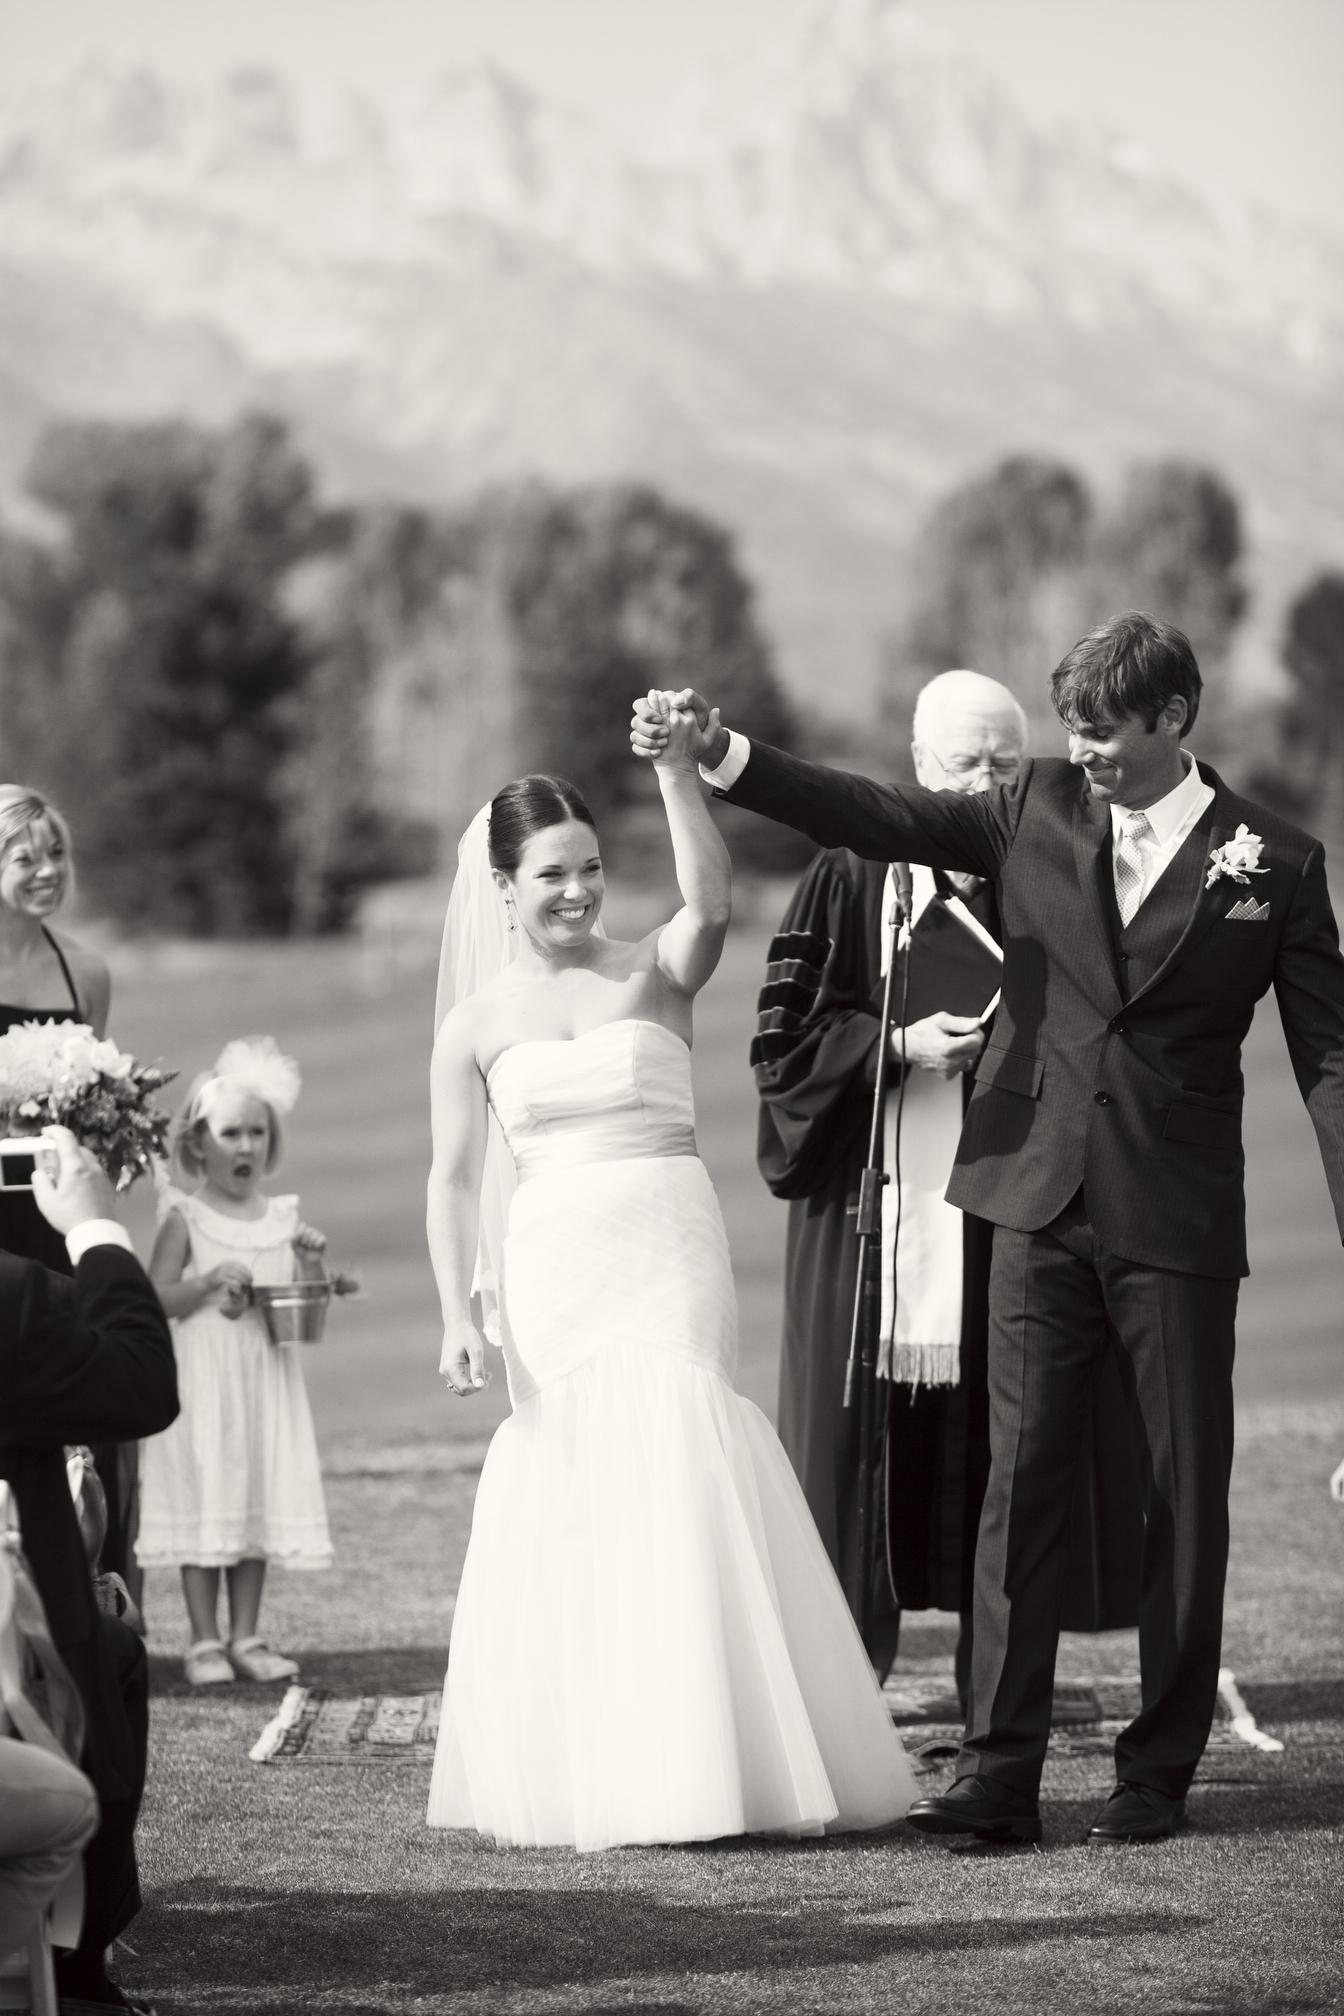 Figenshau Jackson Hole Wedding 2012_1049.JPG